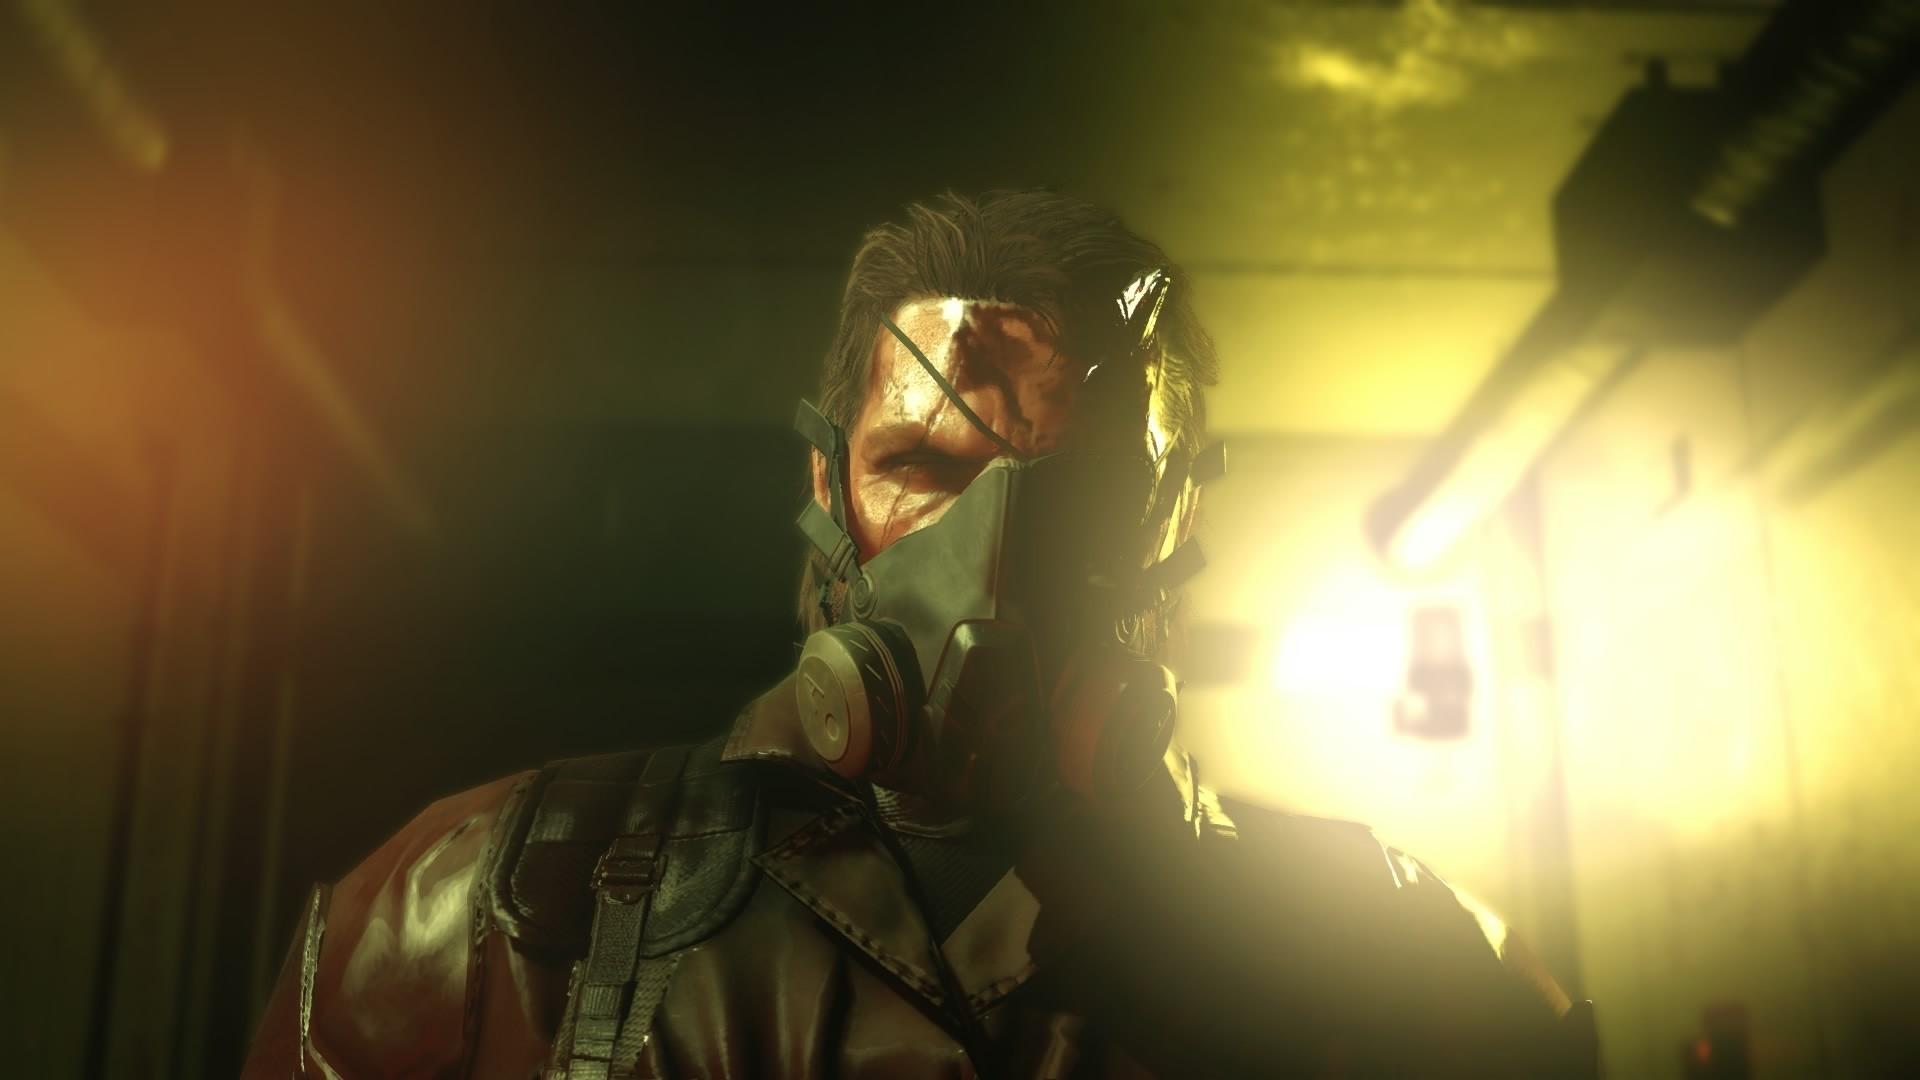 Wallpaper Music Metal Gear Solid V The Phantom Pain